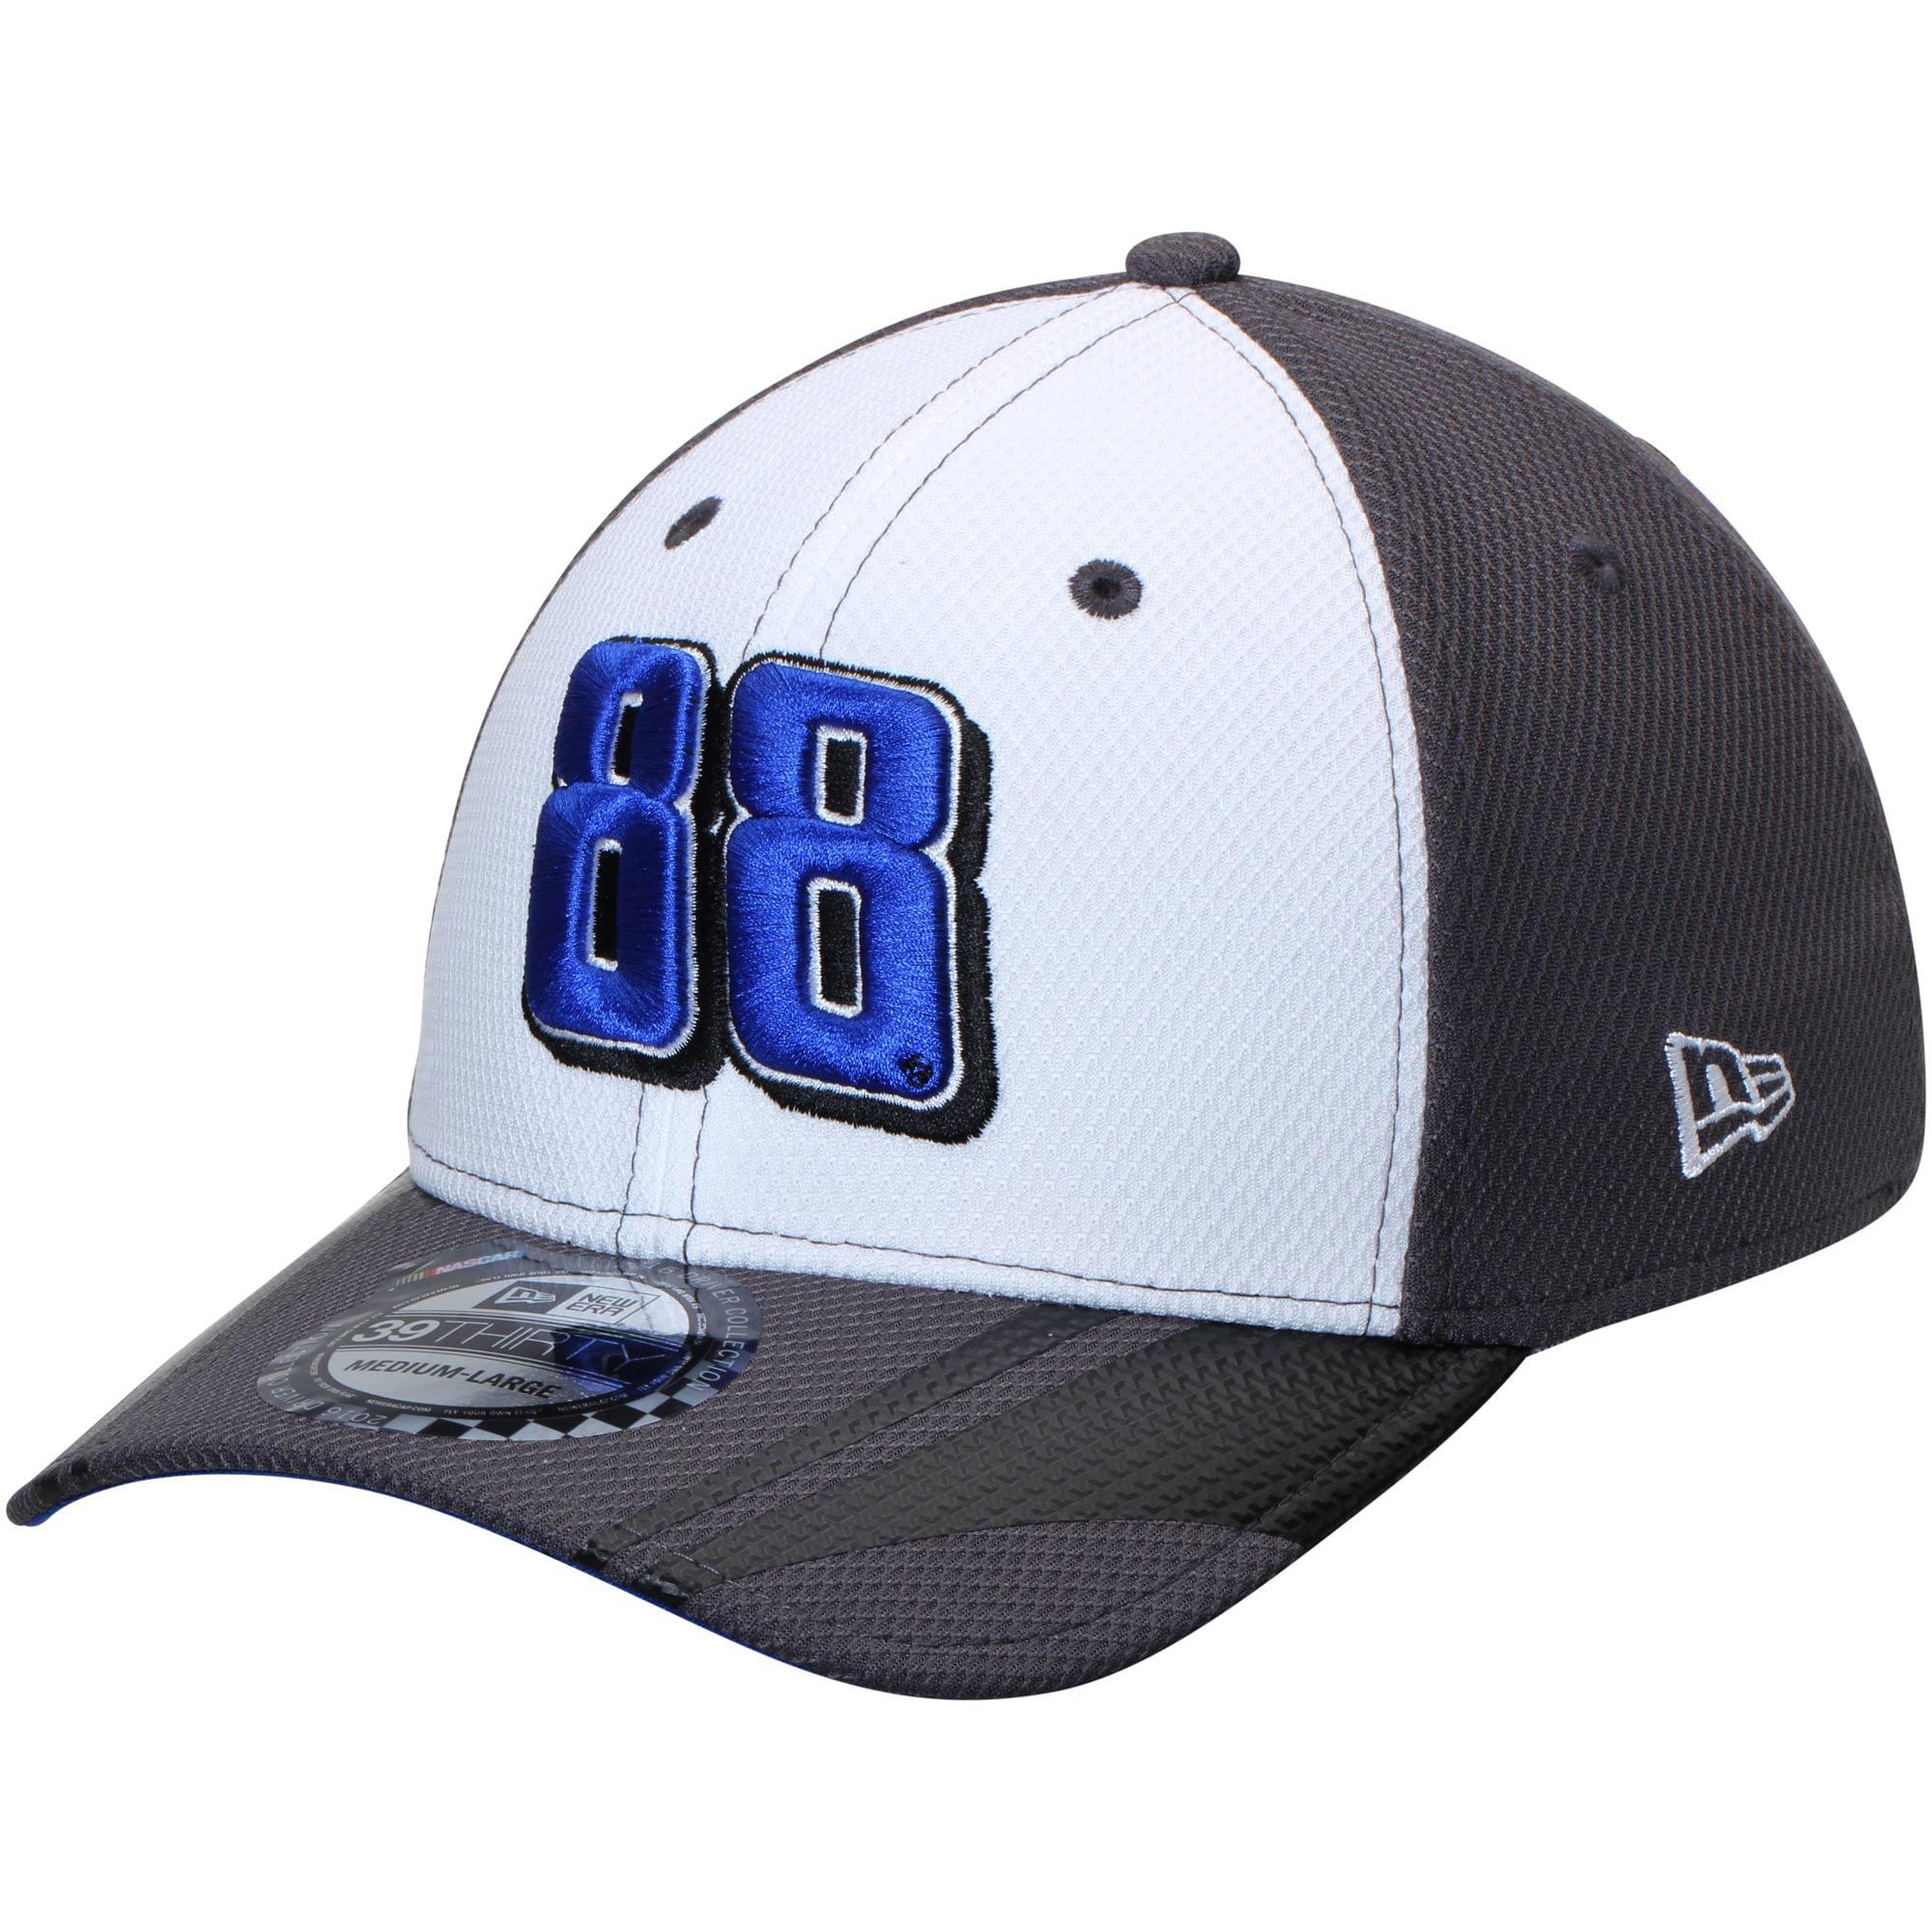 Dale Earnhardt Jr. New Era Alternate Driver 39THIRTY Flex Hat - White/Gray